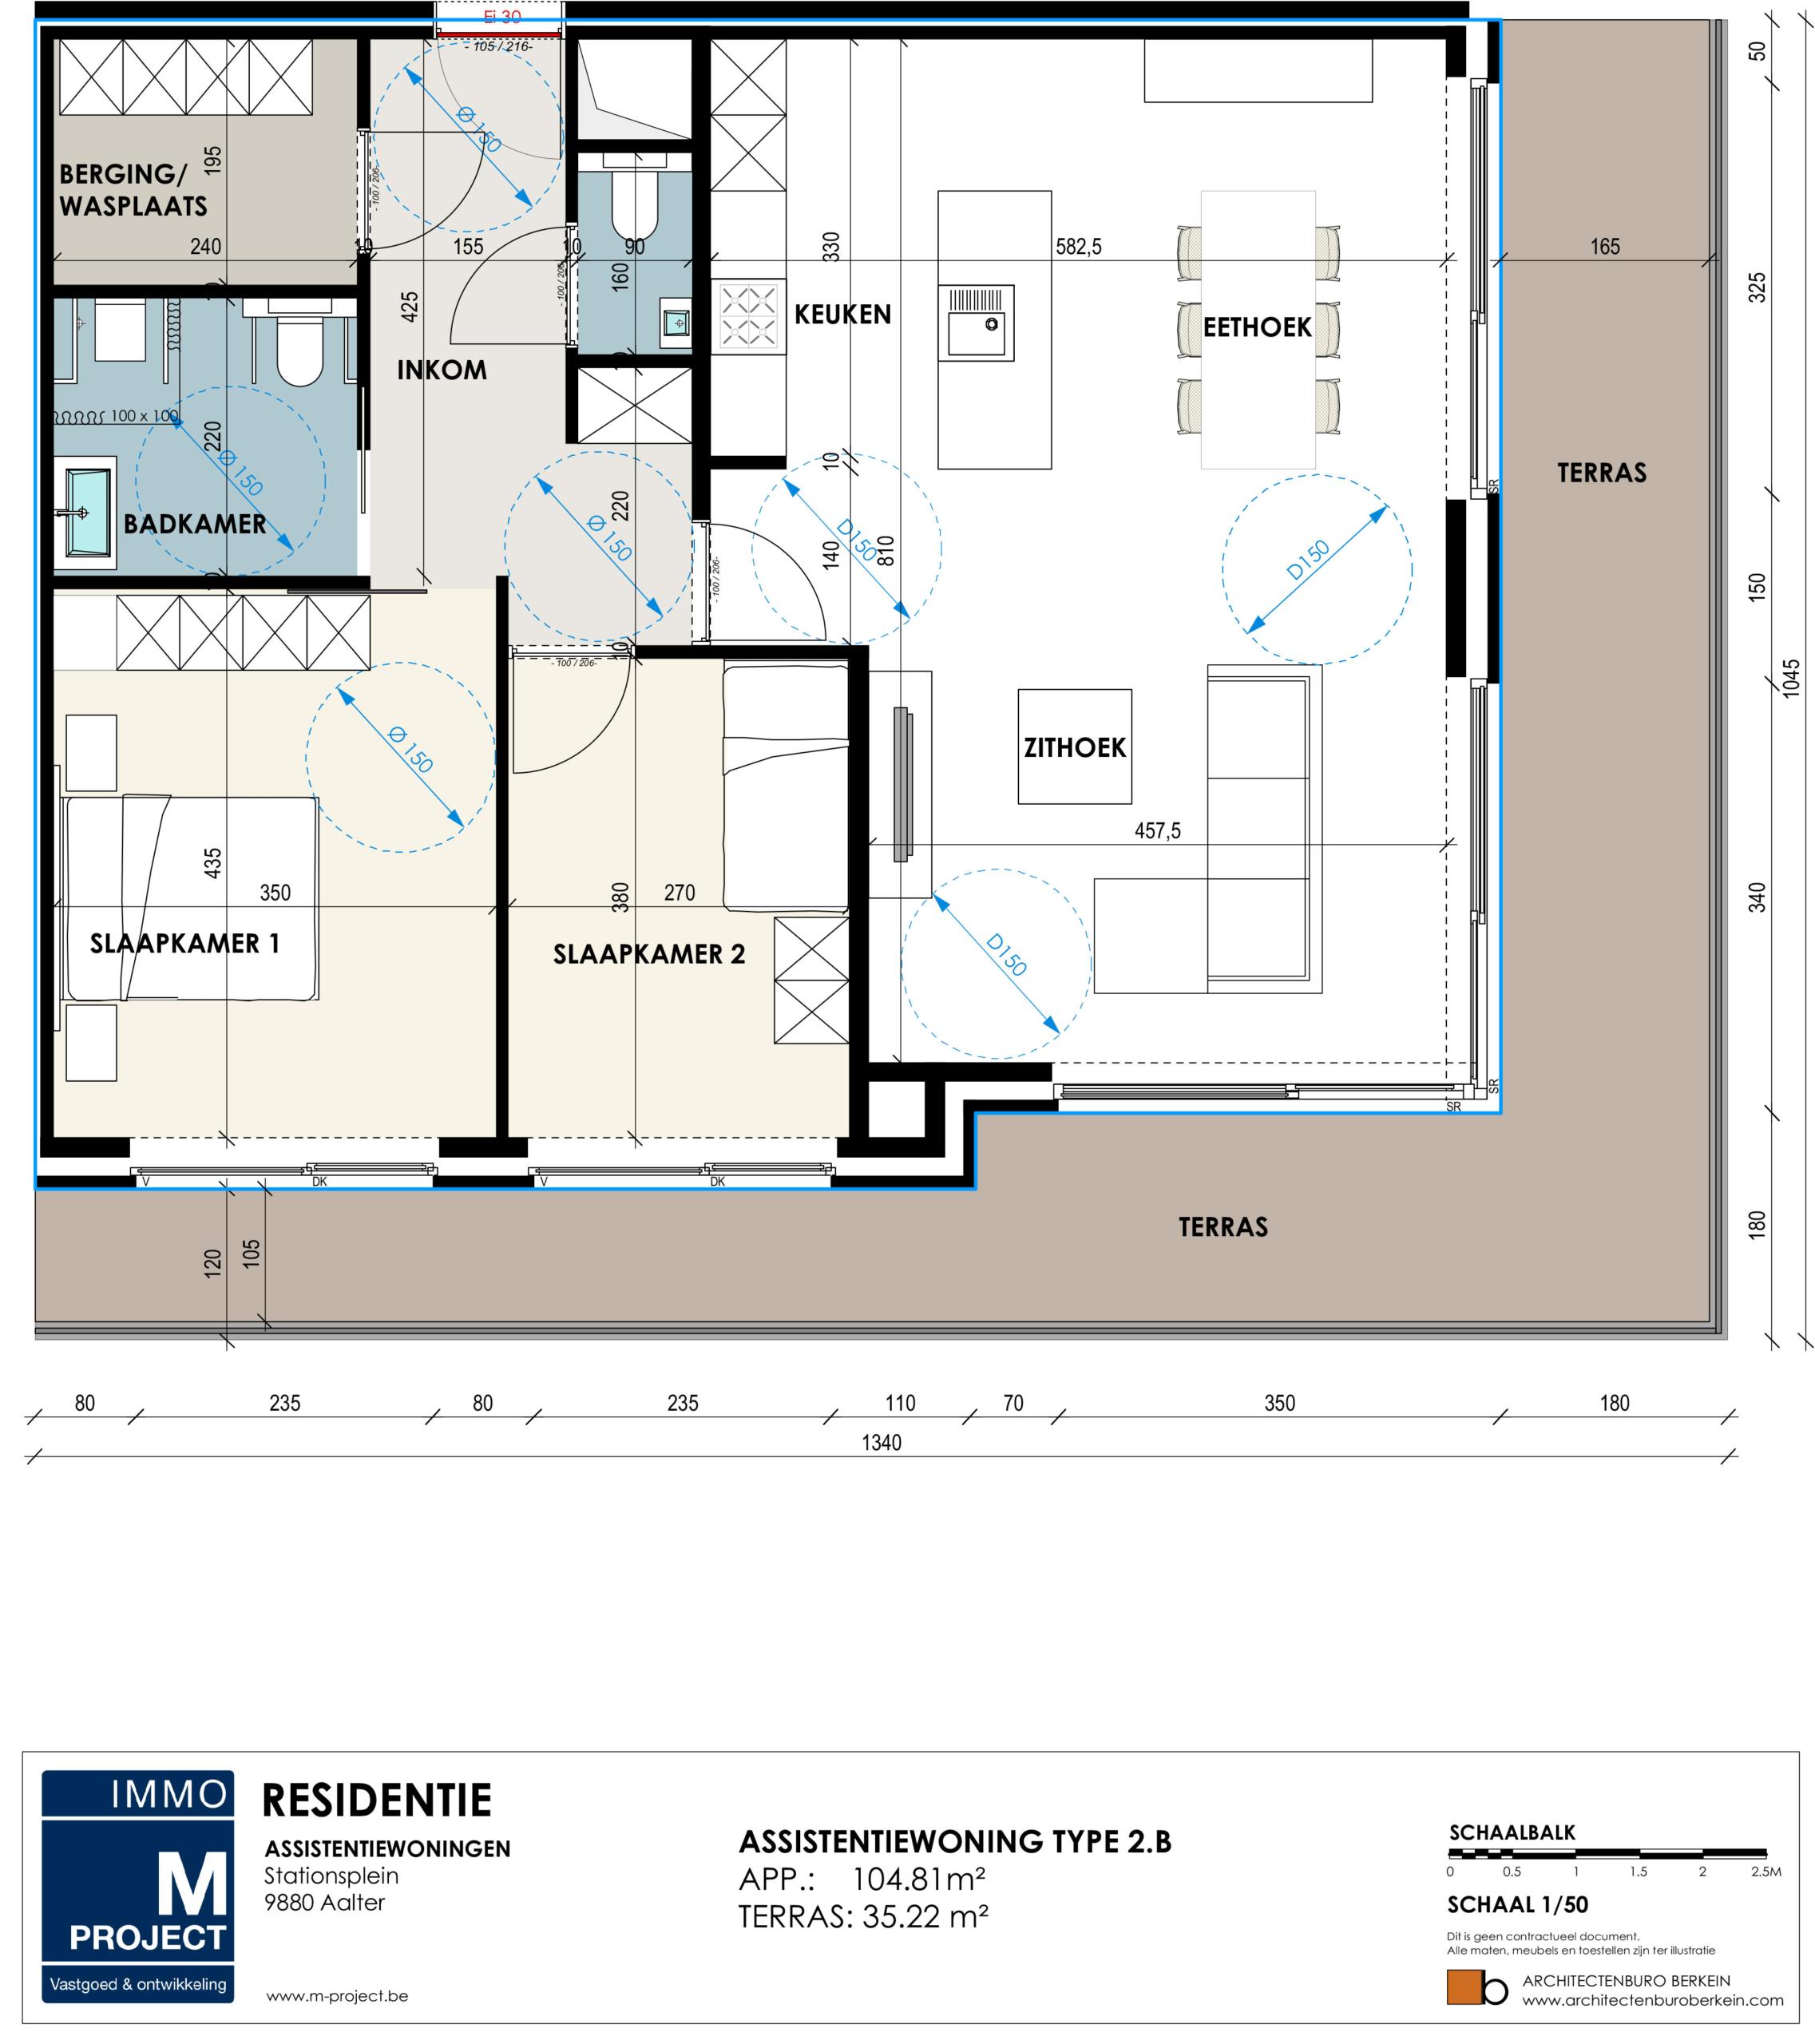 gemeente Aalter, koop of huur in Residentie Academie - appartement type 2B